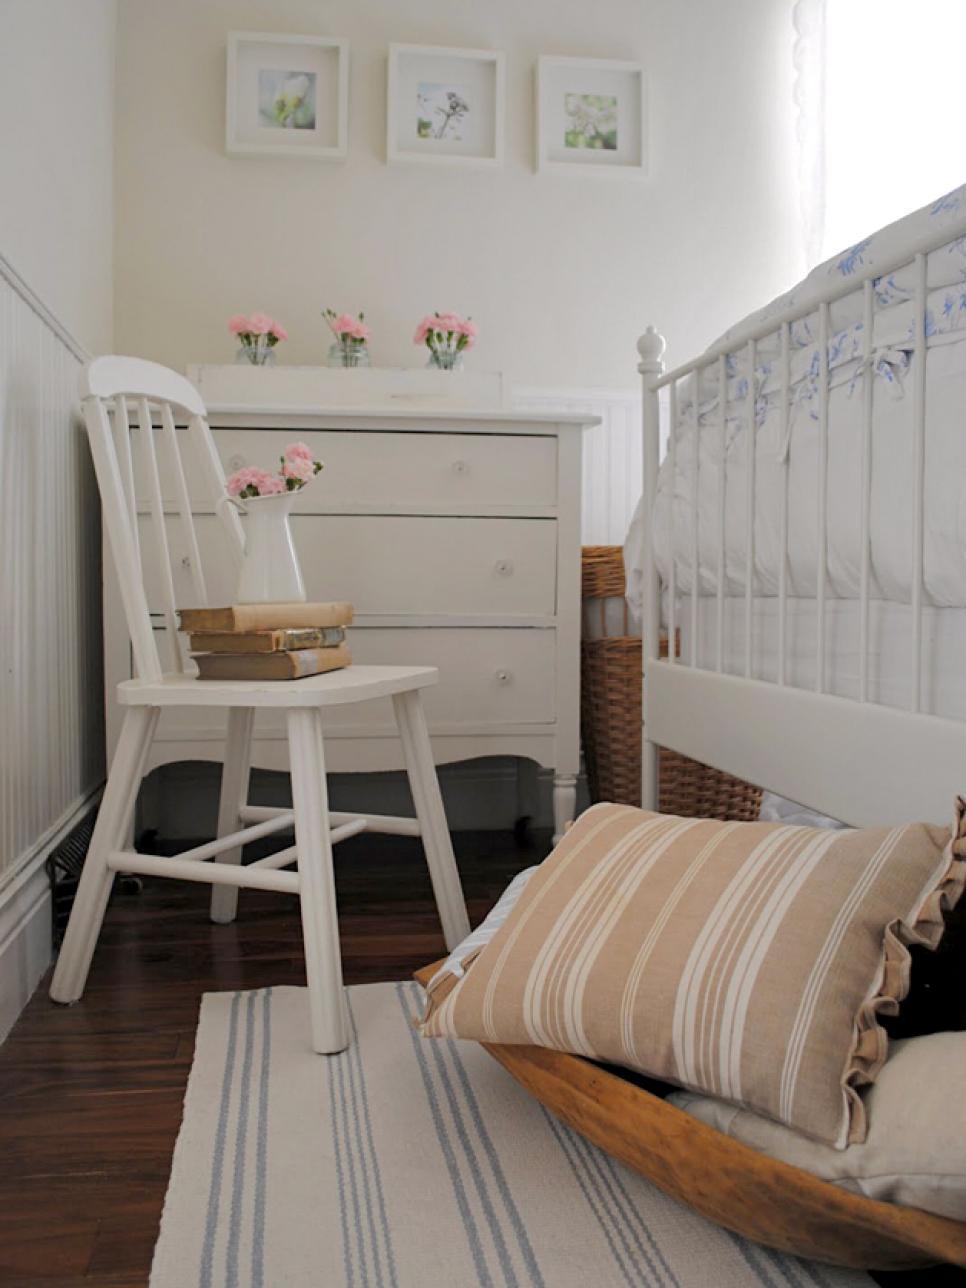 Cozy Retreats: Smart Design Ideas for Small Bedrooms ... on Bedroom Ideas For Small Rooms  id=96225